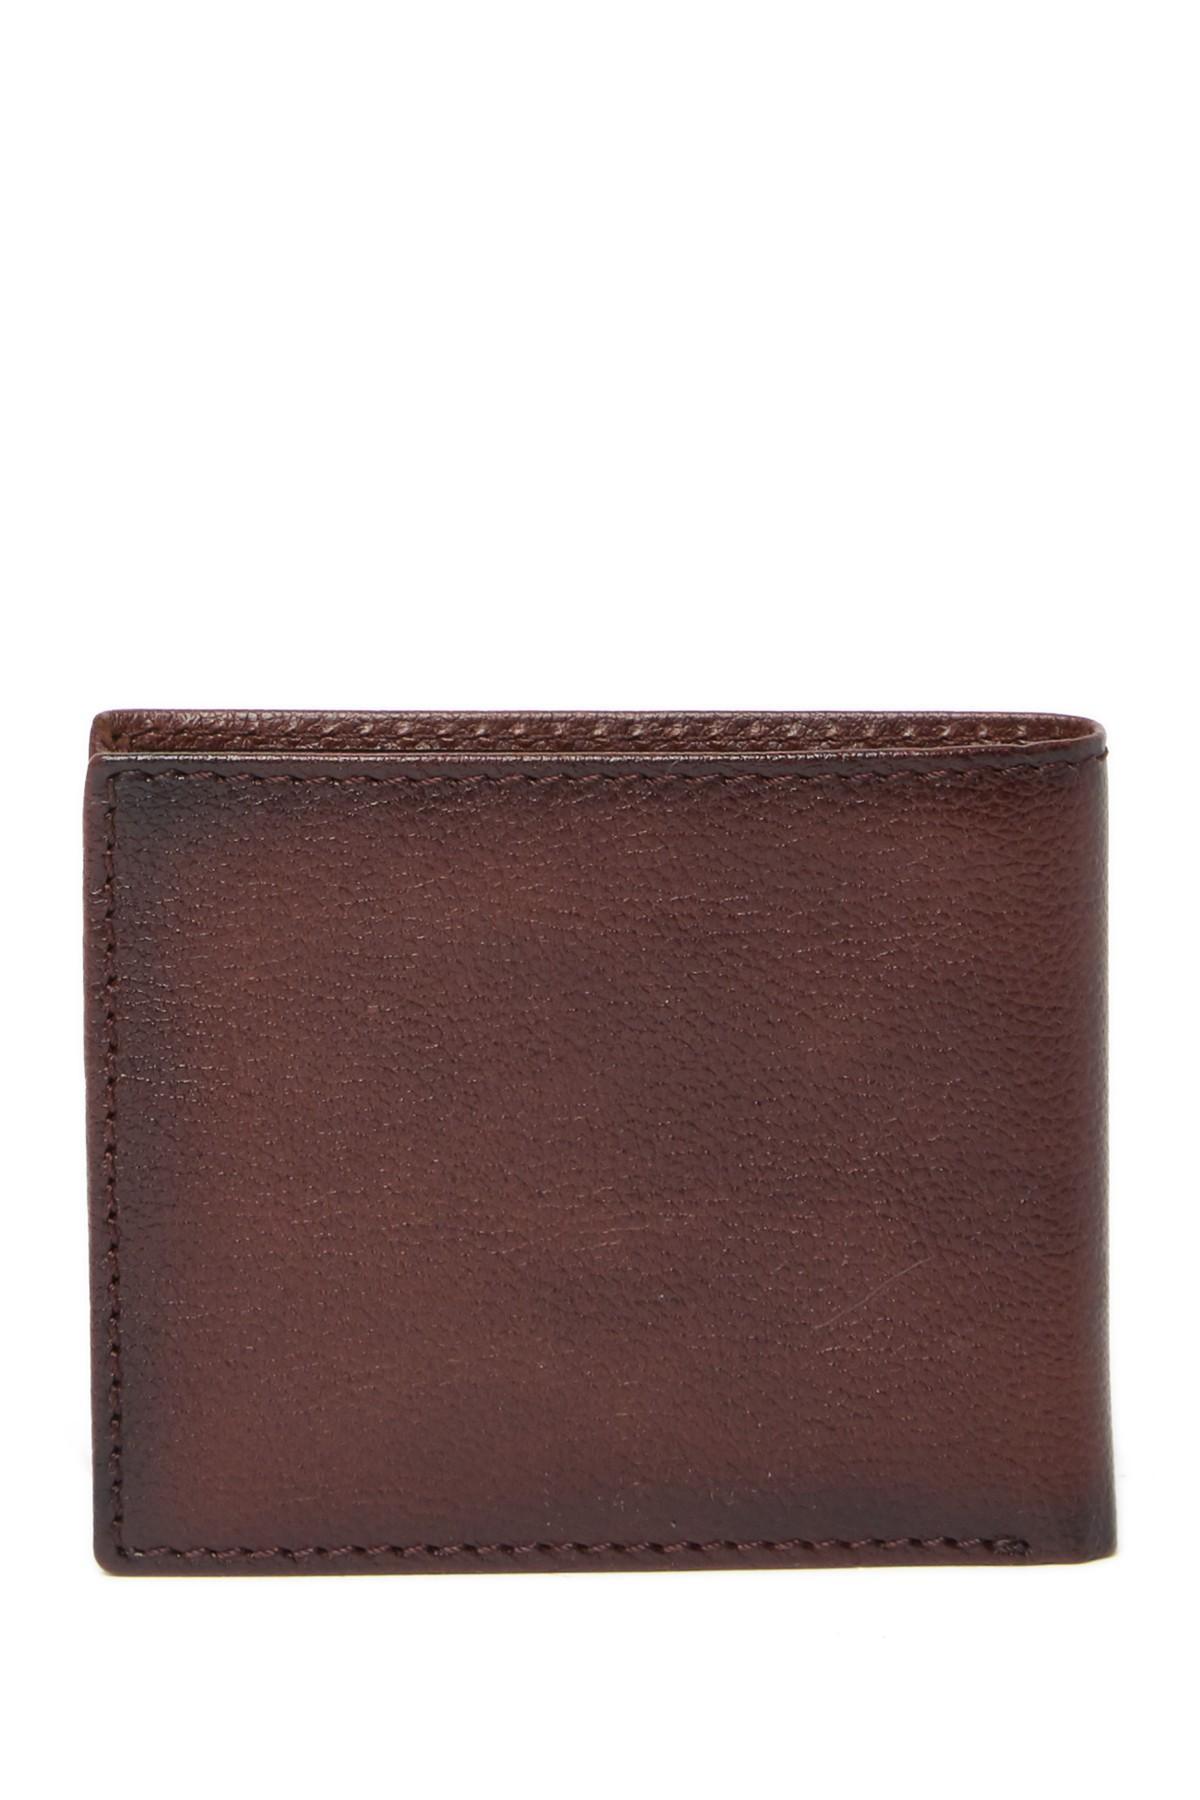 d0823156f Boconi - Brown Stills Leather Billfold Wallet for Men - Lyst. View  fullscreen